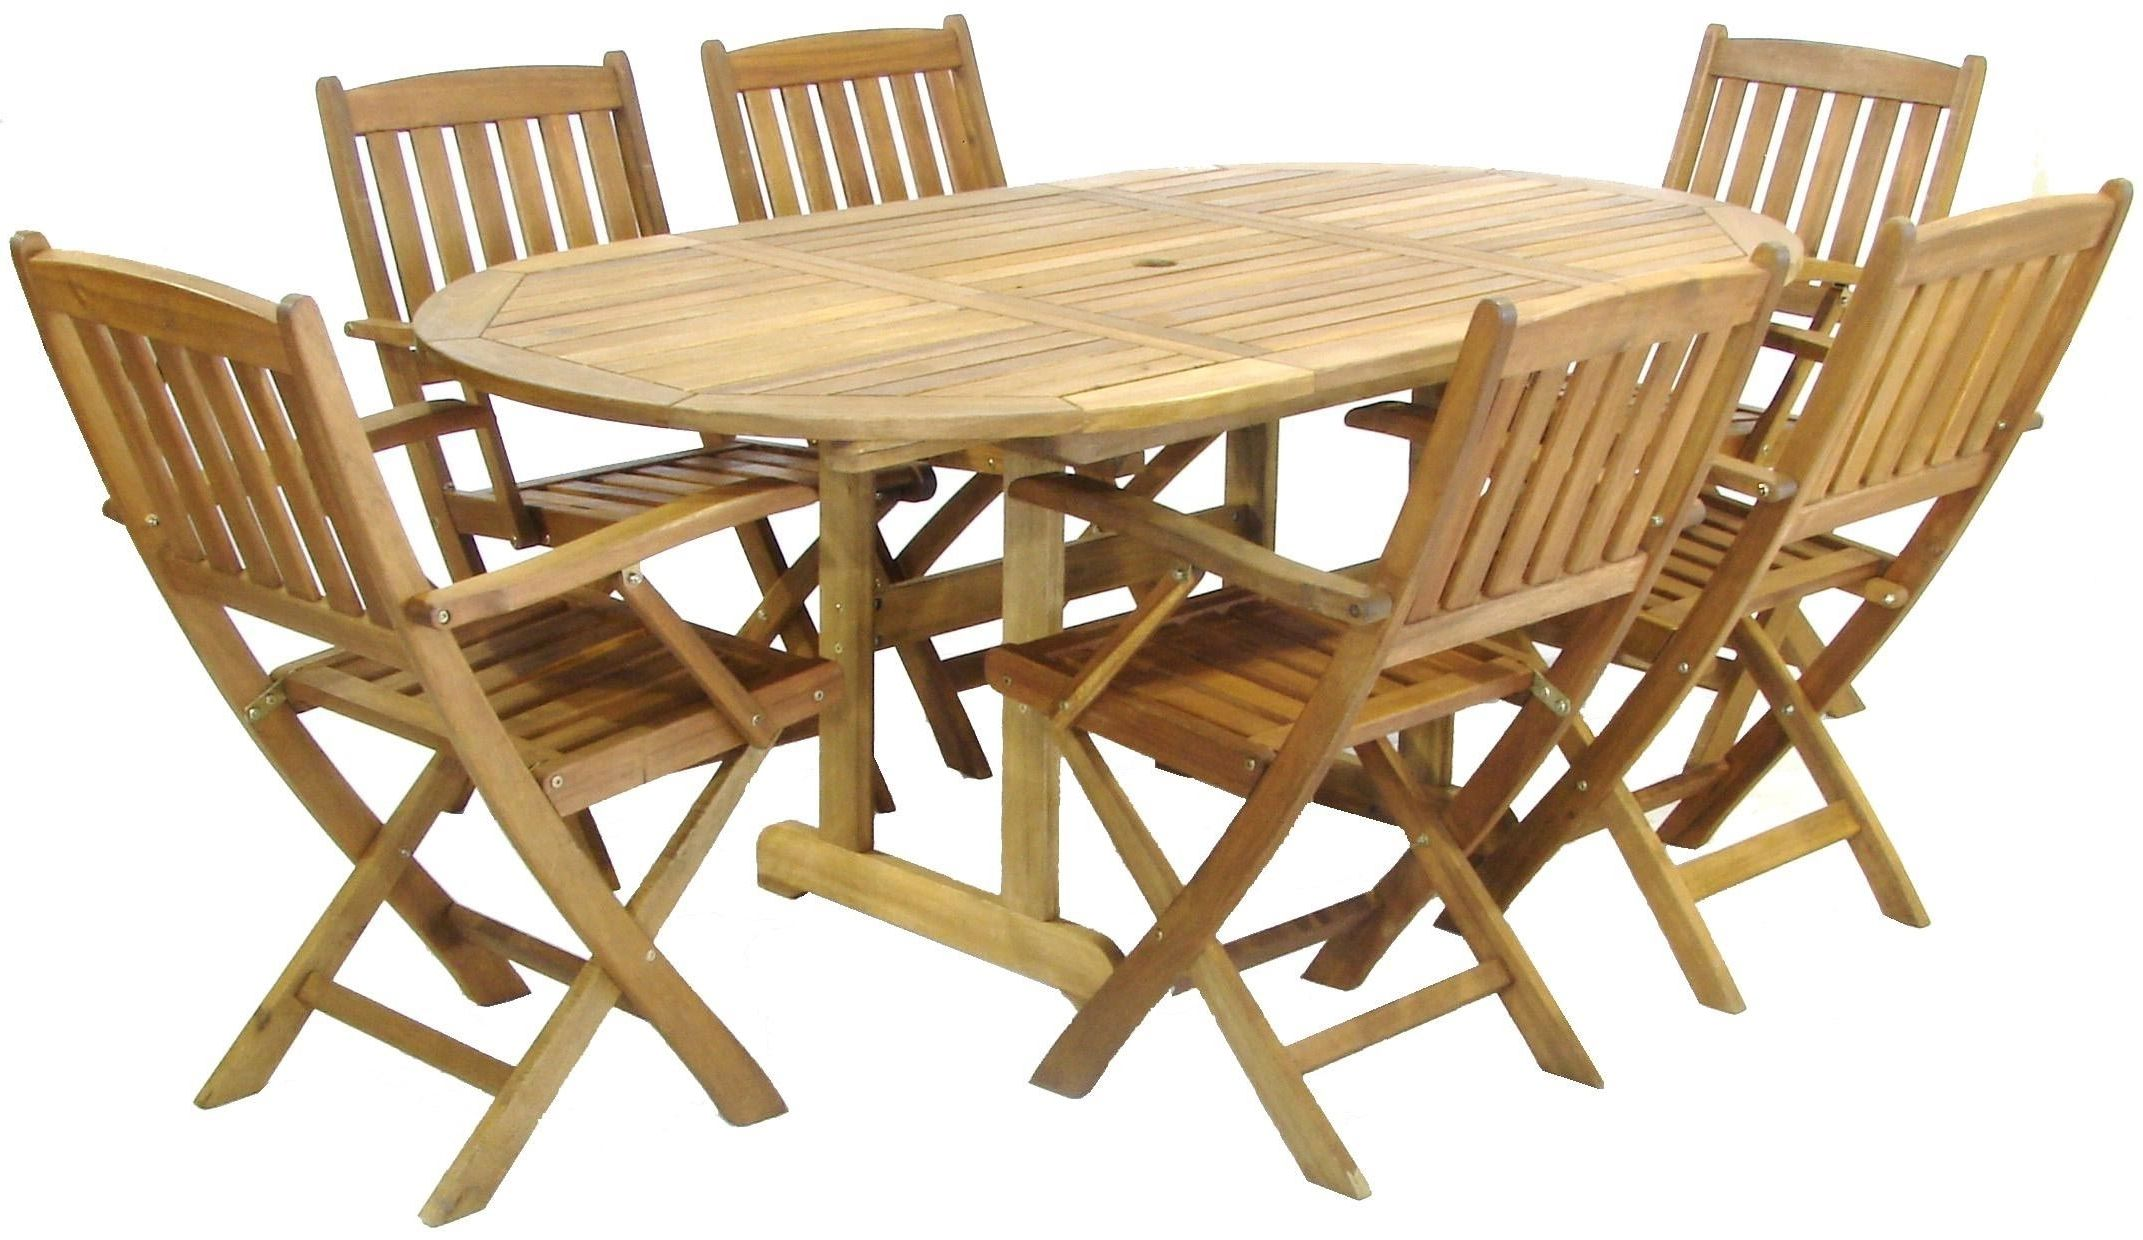 Folding Dining Chairs Asda | Folding Chairs | Pinterest